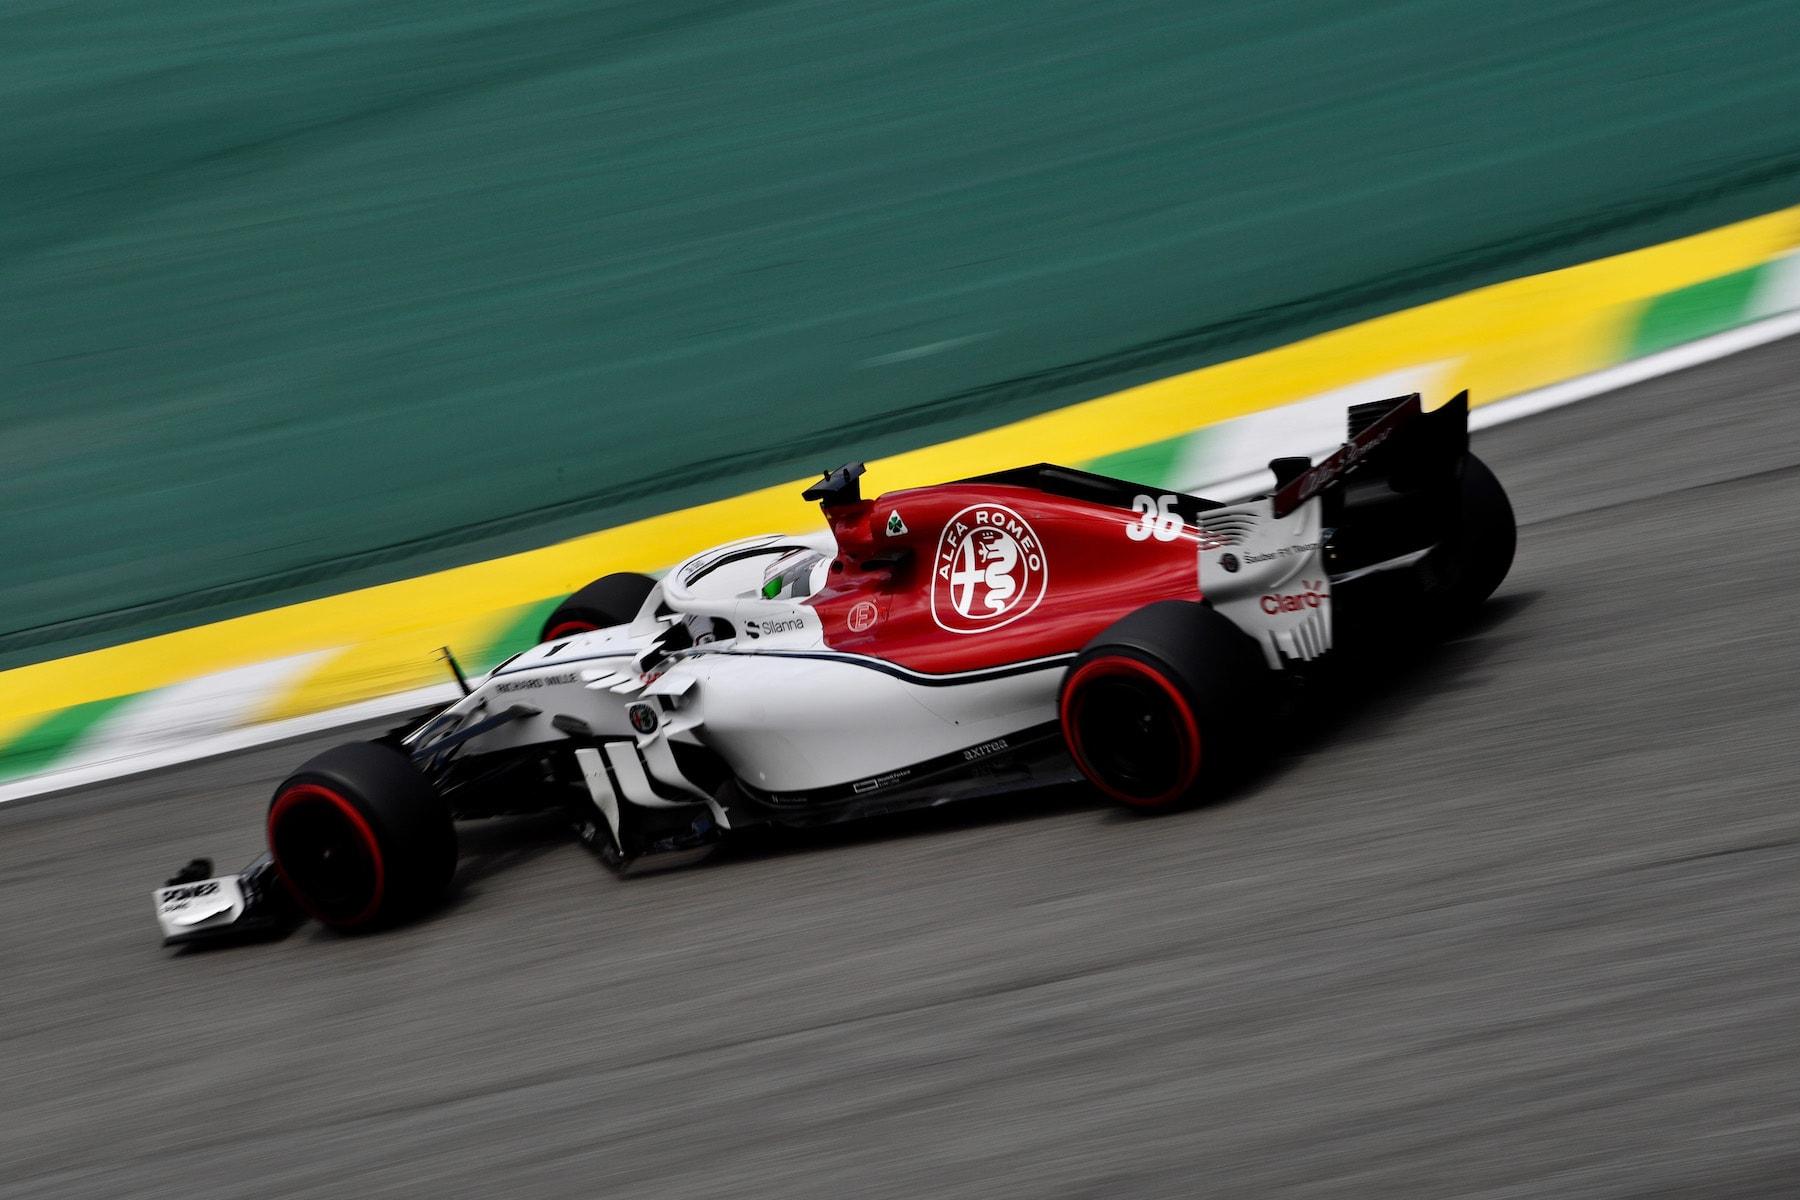 2018 Antonio Giovinazzi | Sauber C37 | 2018 Brazilian GP FP1 1 copy.jpg